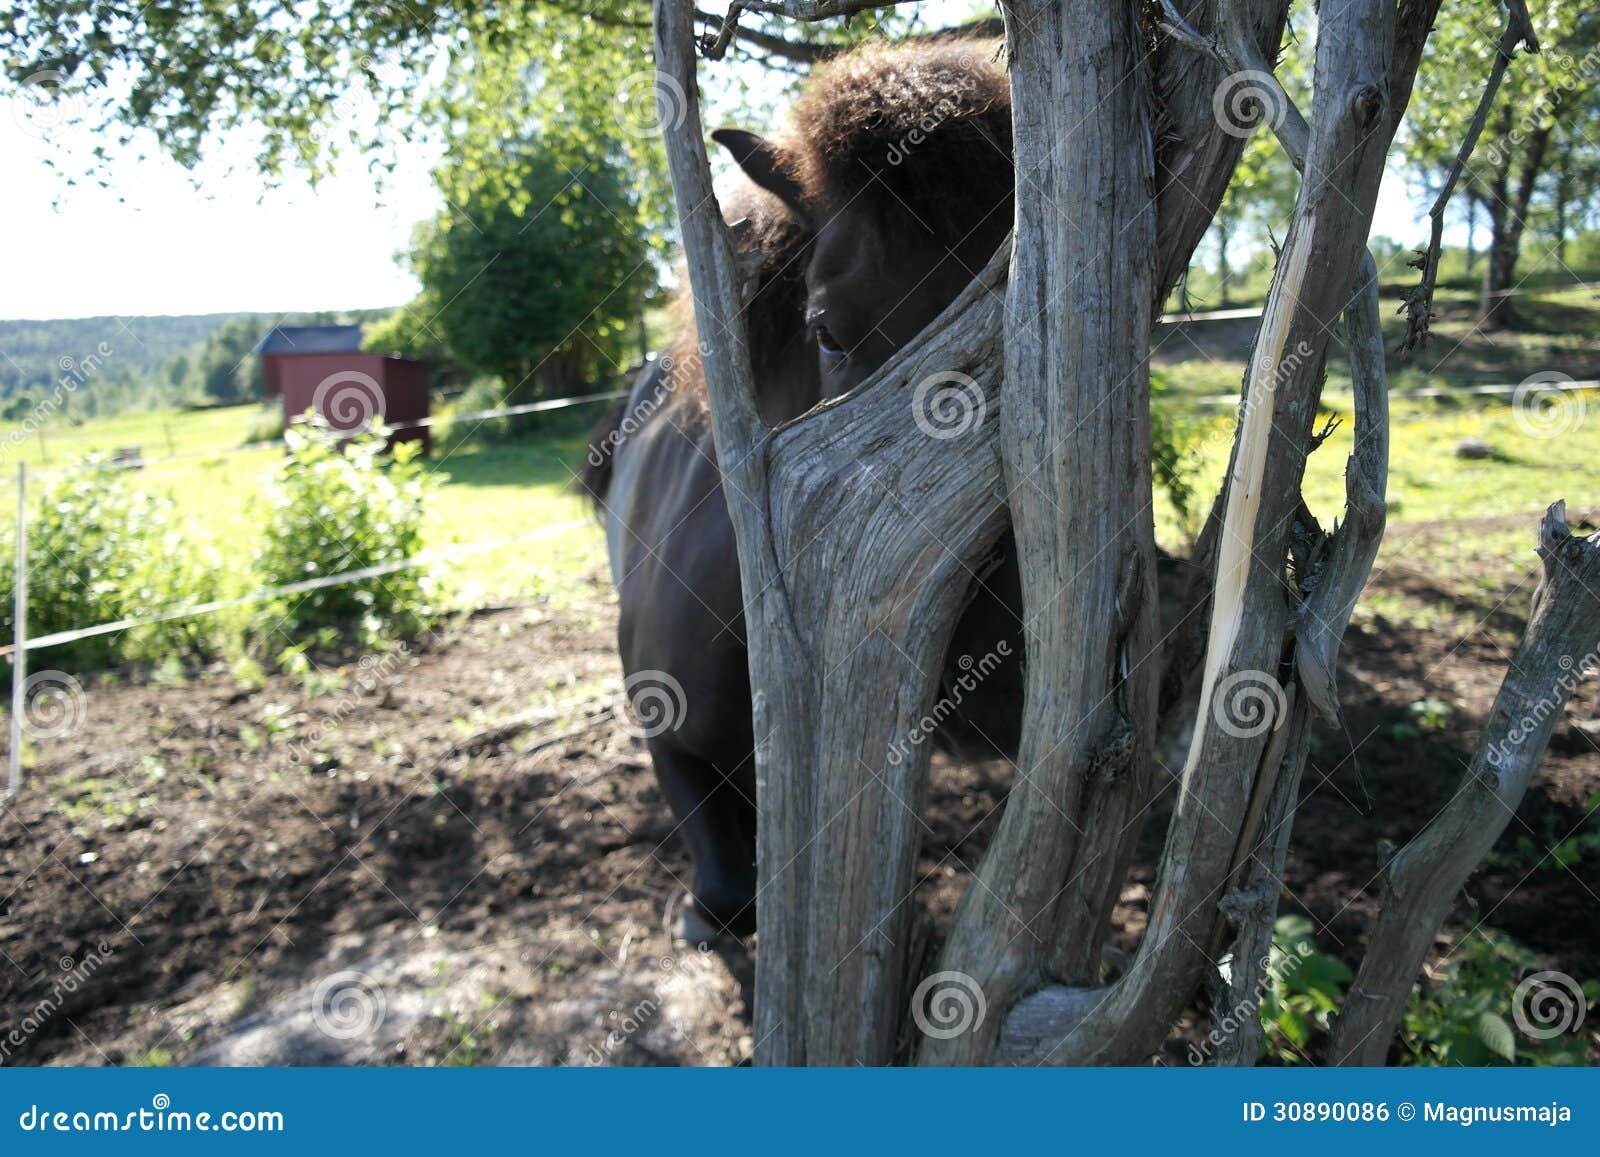 Iclelandic Horse Behind A Tree Royalty Free Stock Image